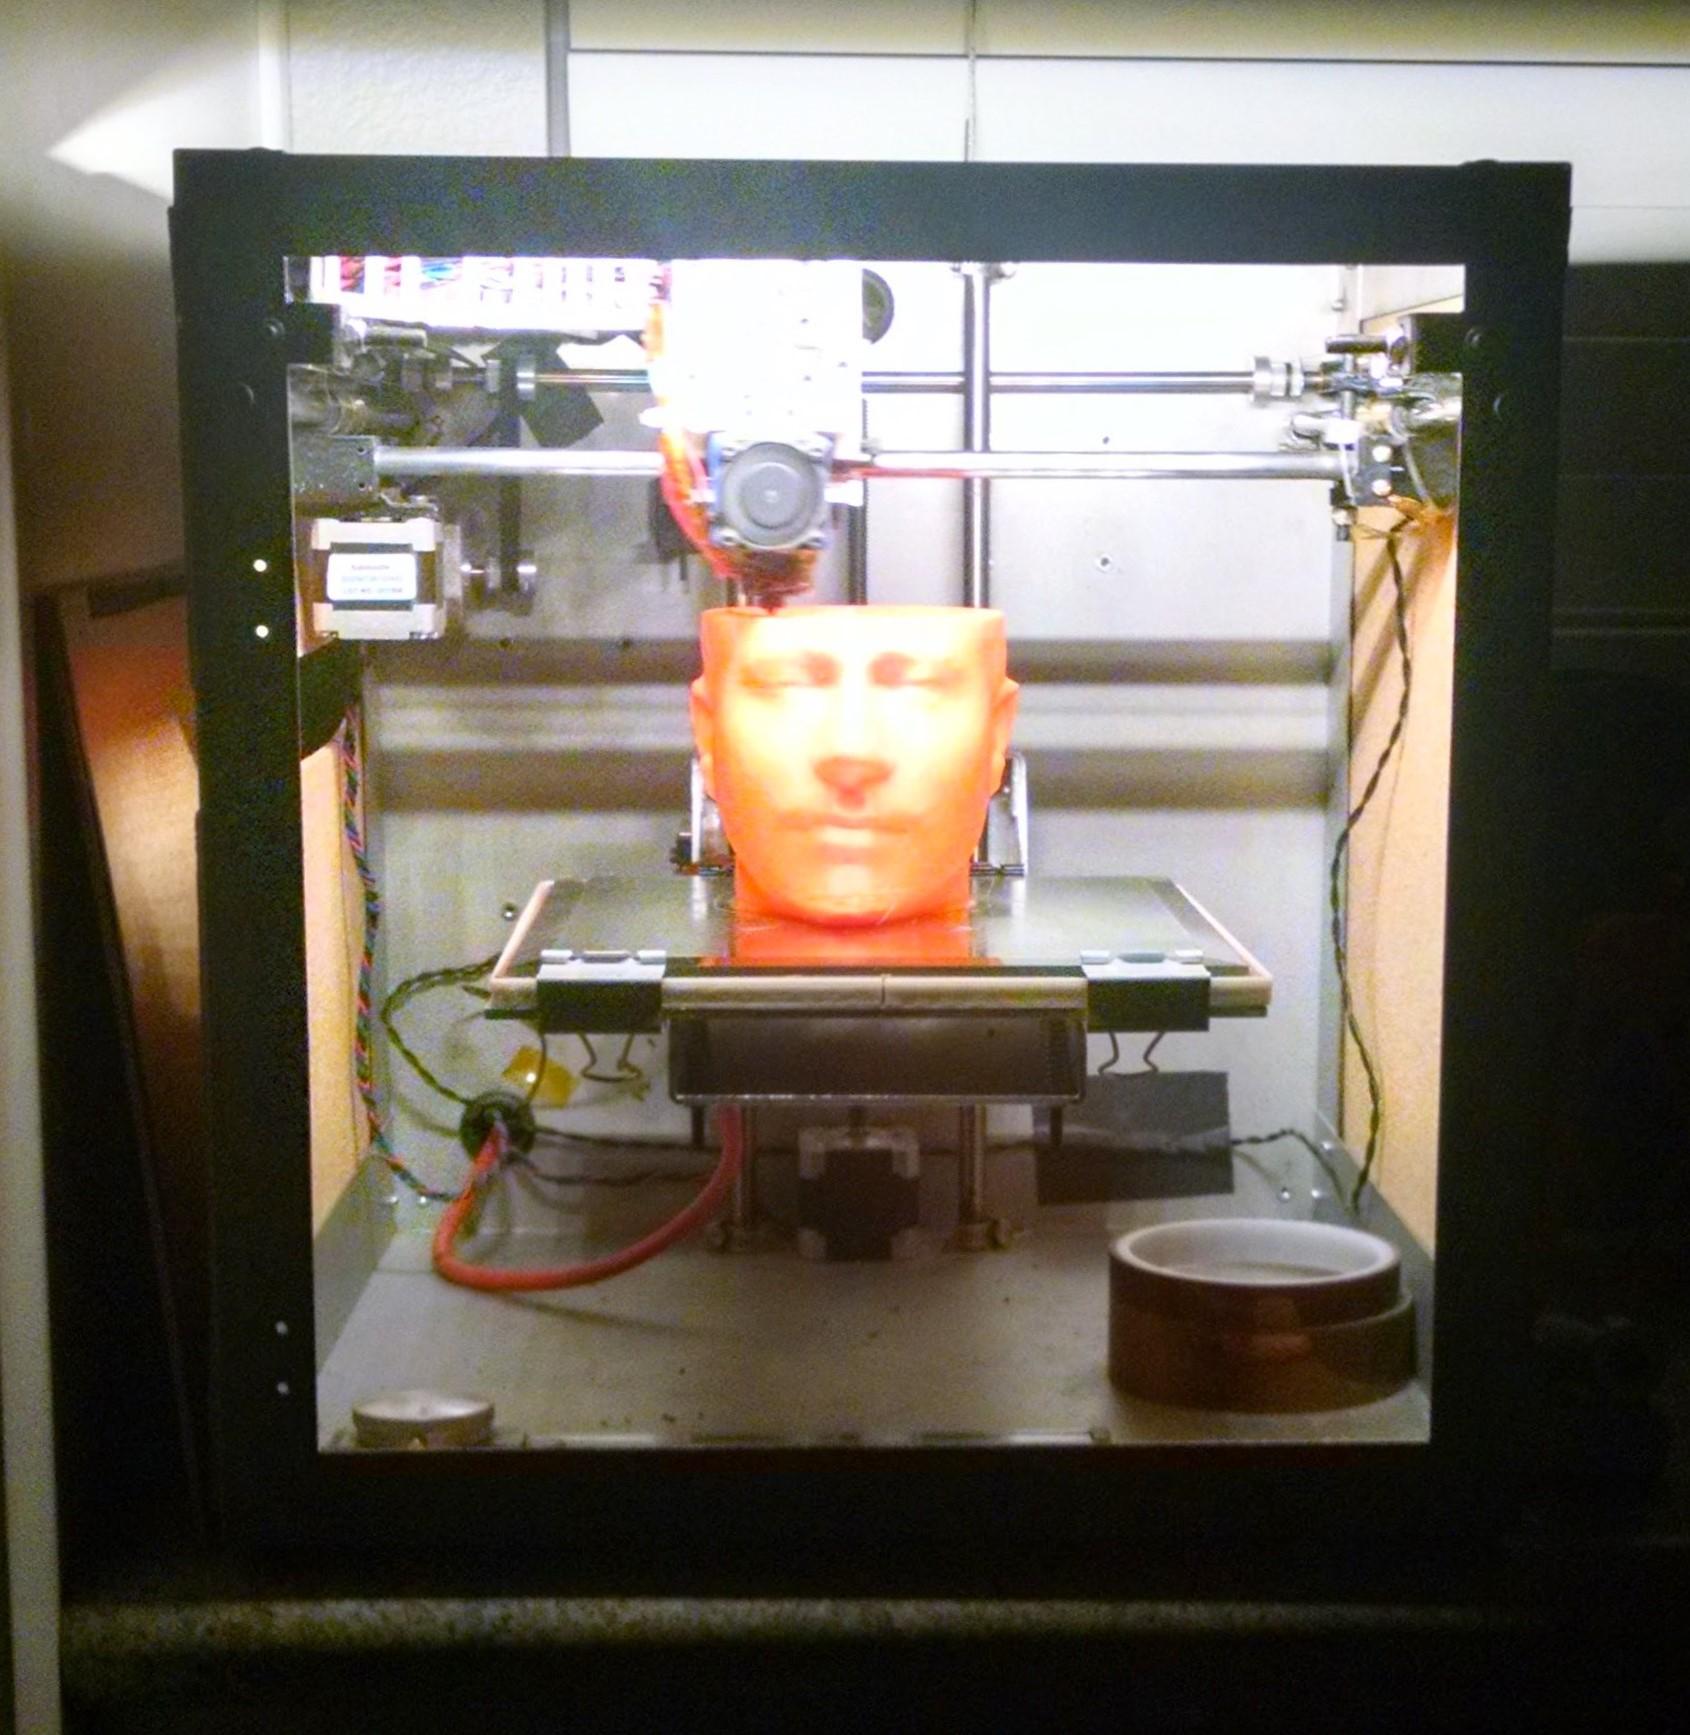 3d Printed Bust